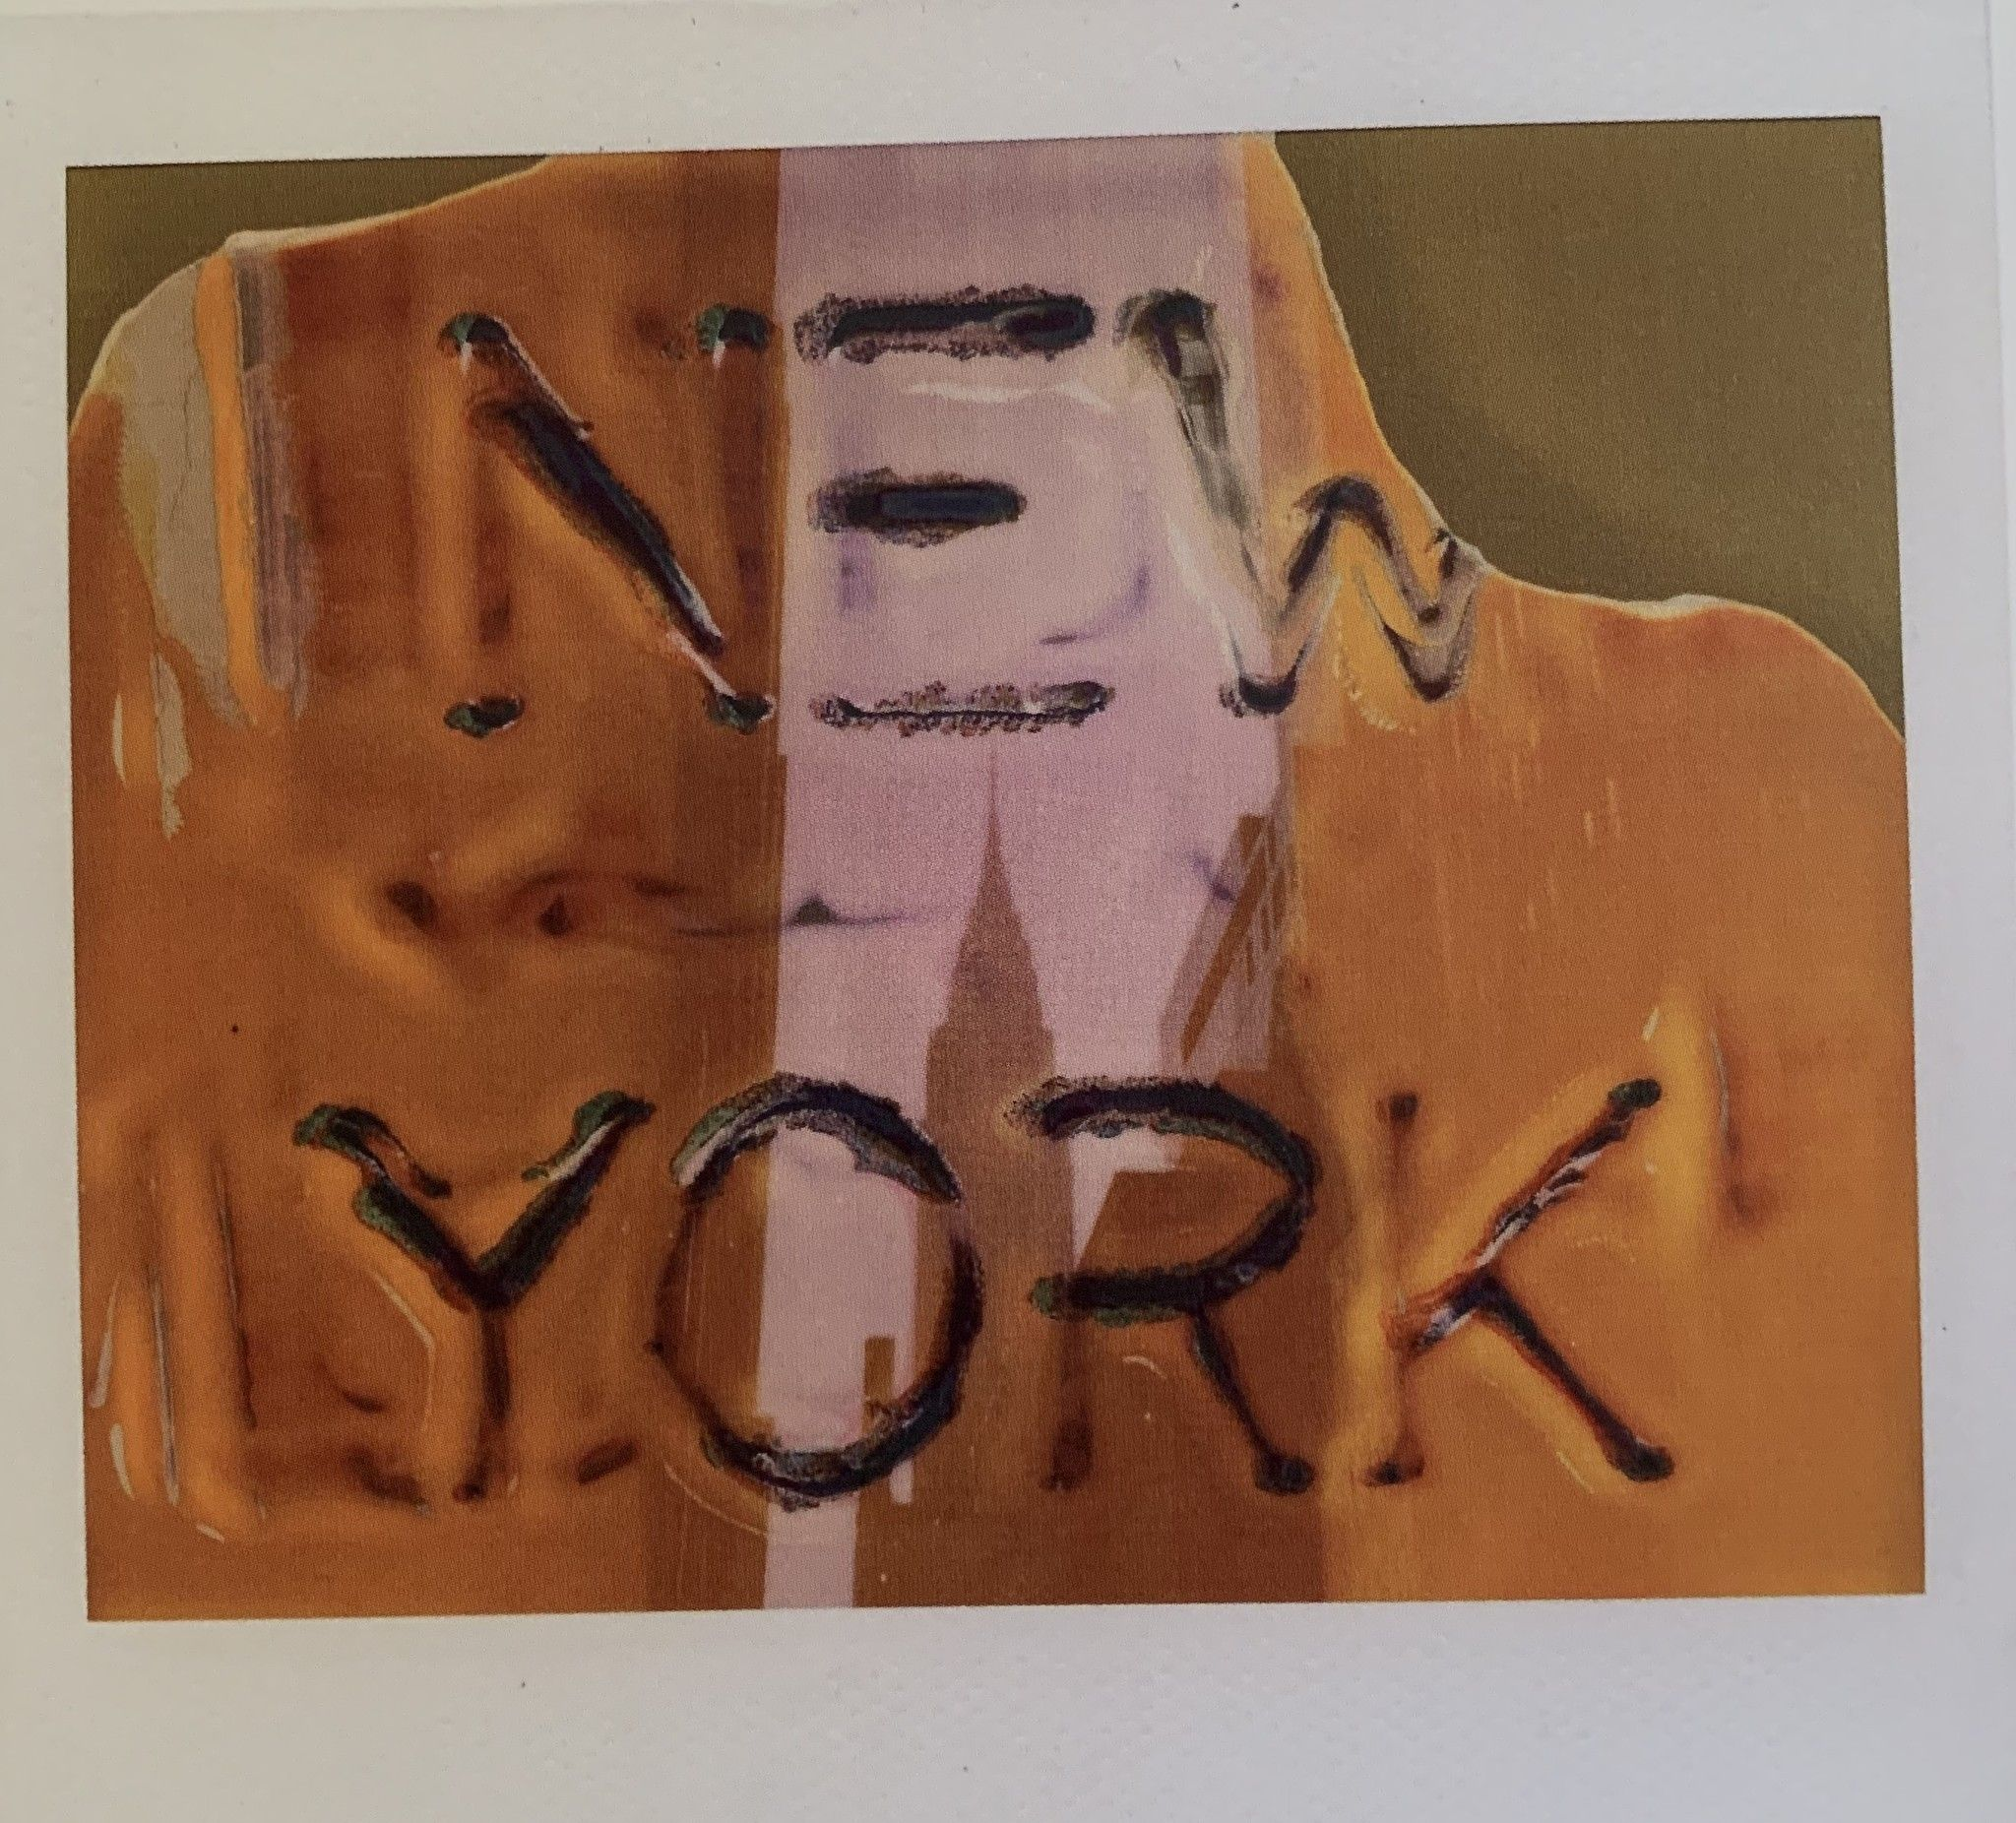 VINTAGE POLAROID MAURIZIO GALIMBERTI  ' NEW YORK FUJI 02 '  dimensioni 34 x 34 cm.